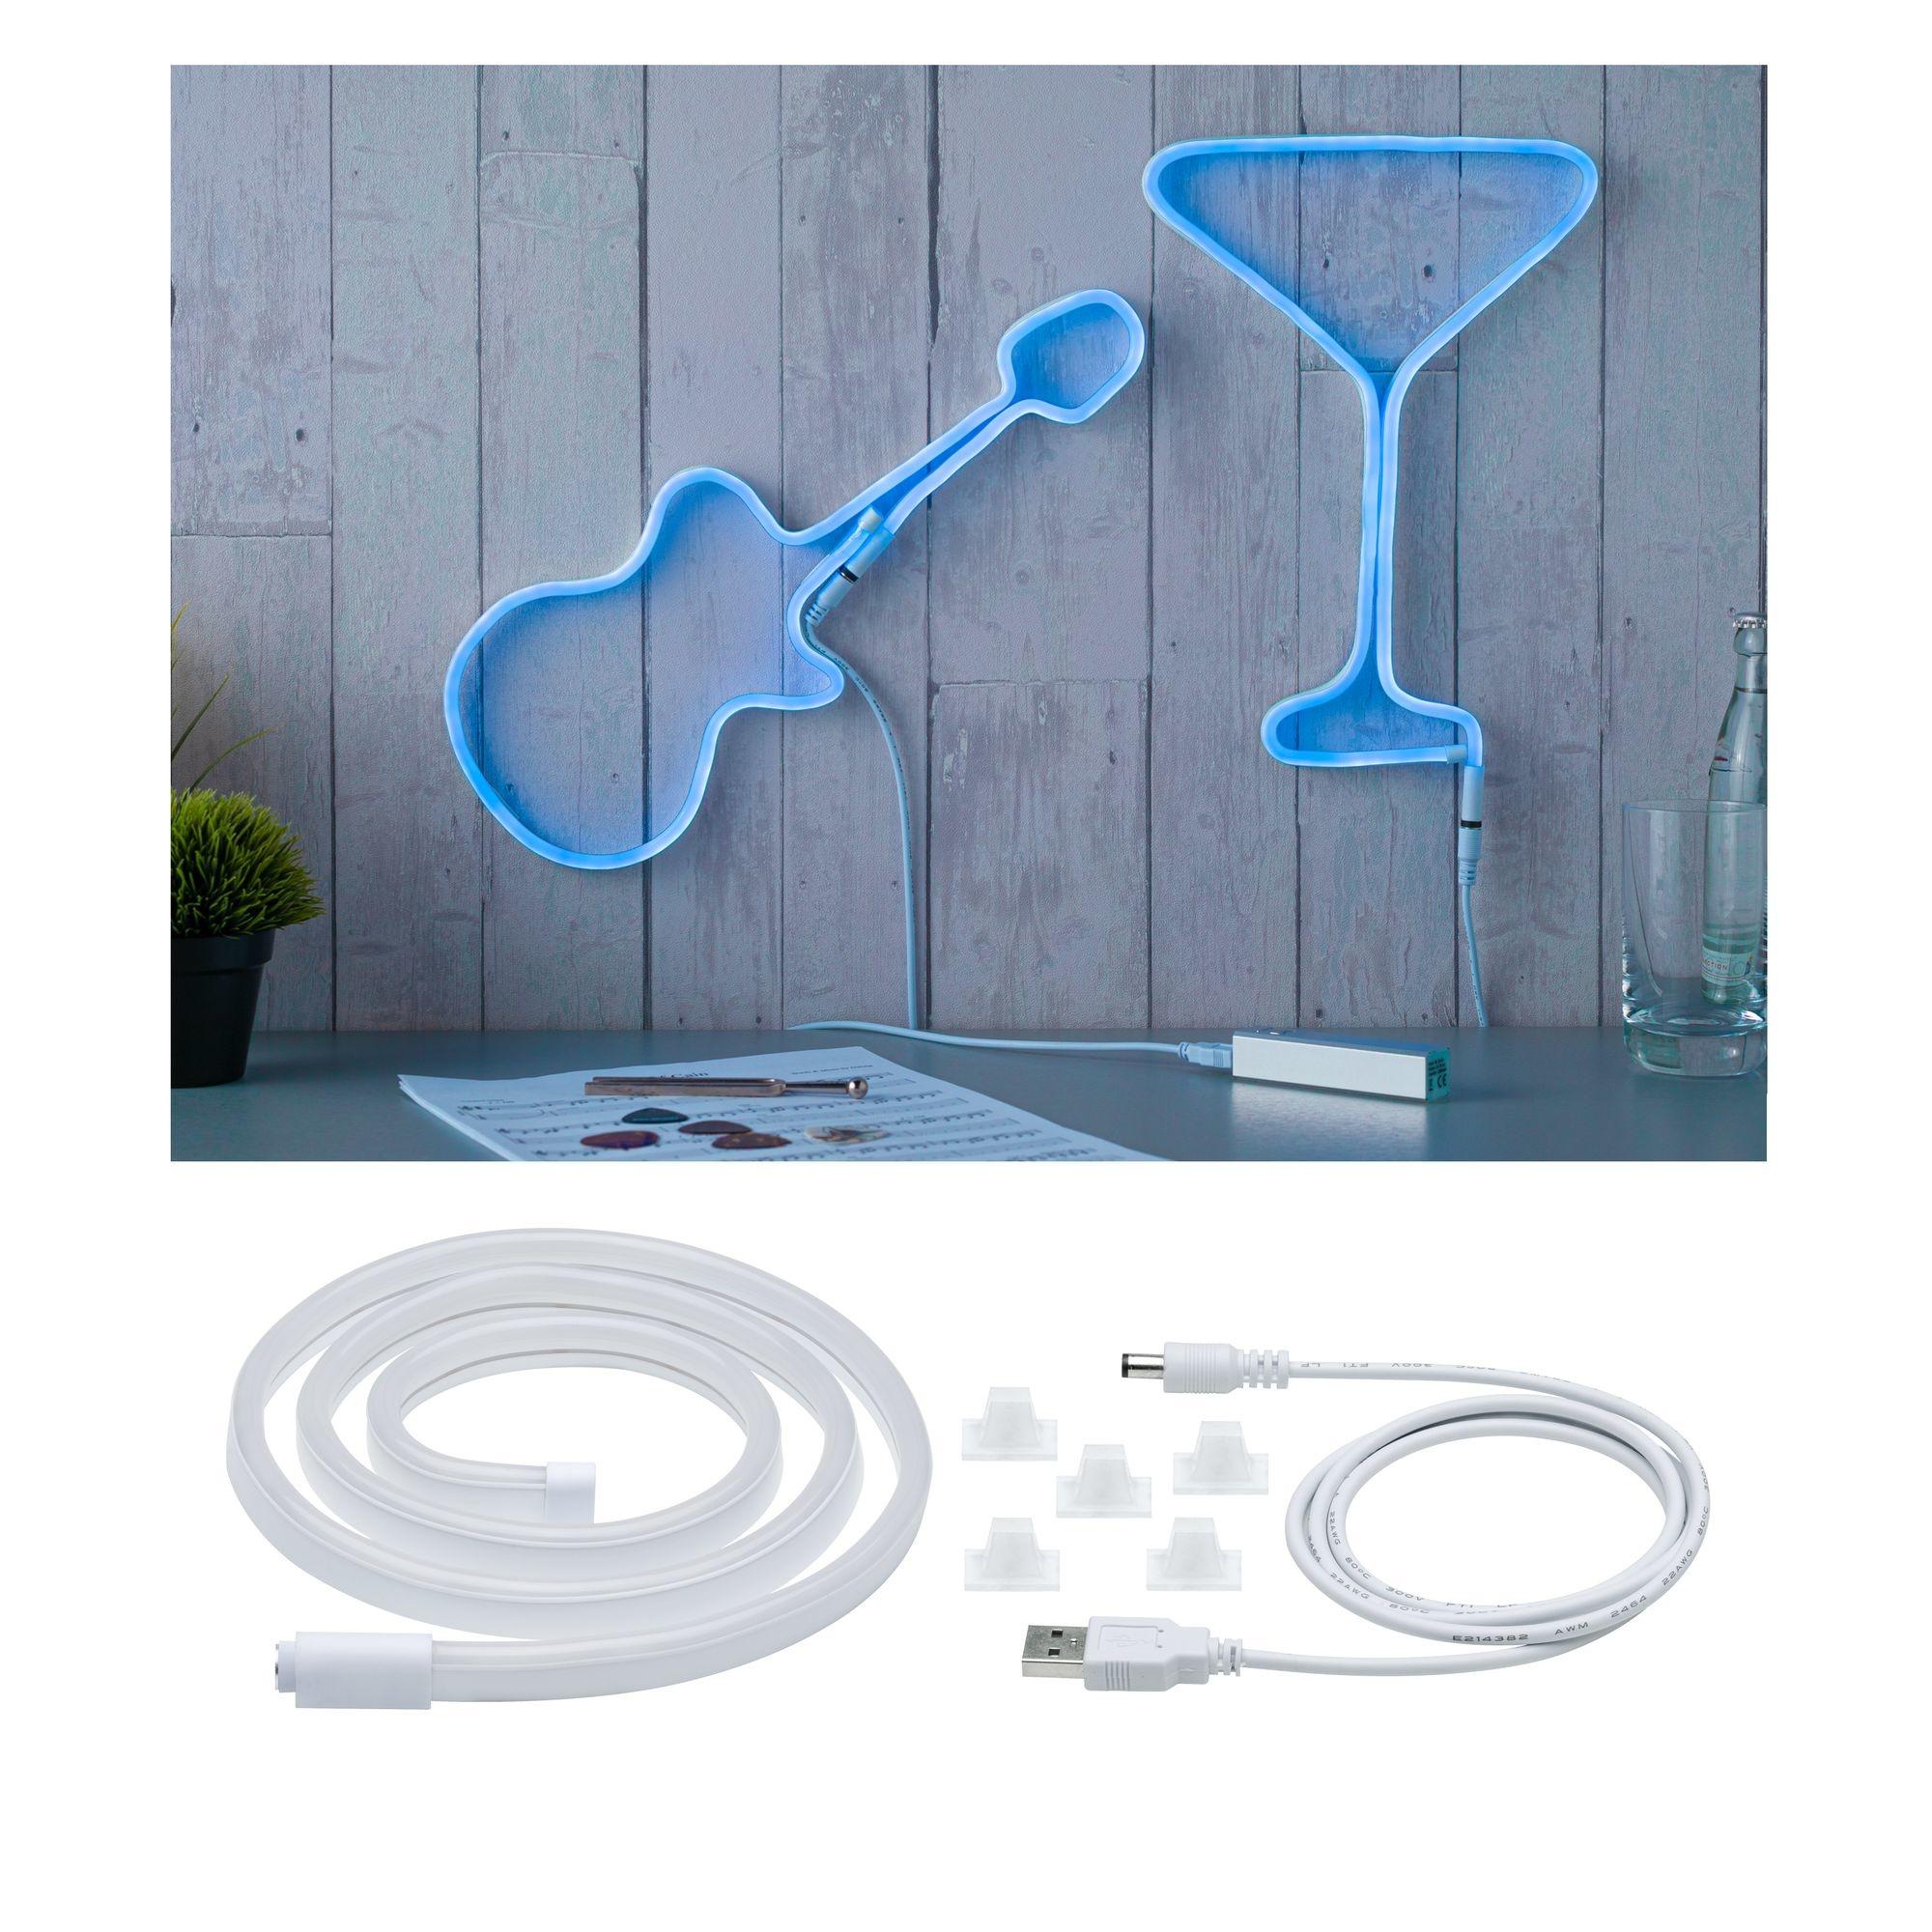 Paulmann Neon Colorflex USB Strip Blue 1m 4,5W 5V Blau/Weiß Kunststoff